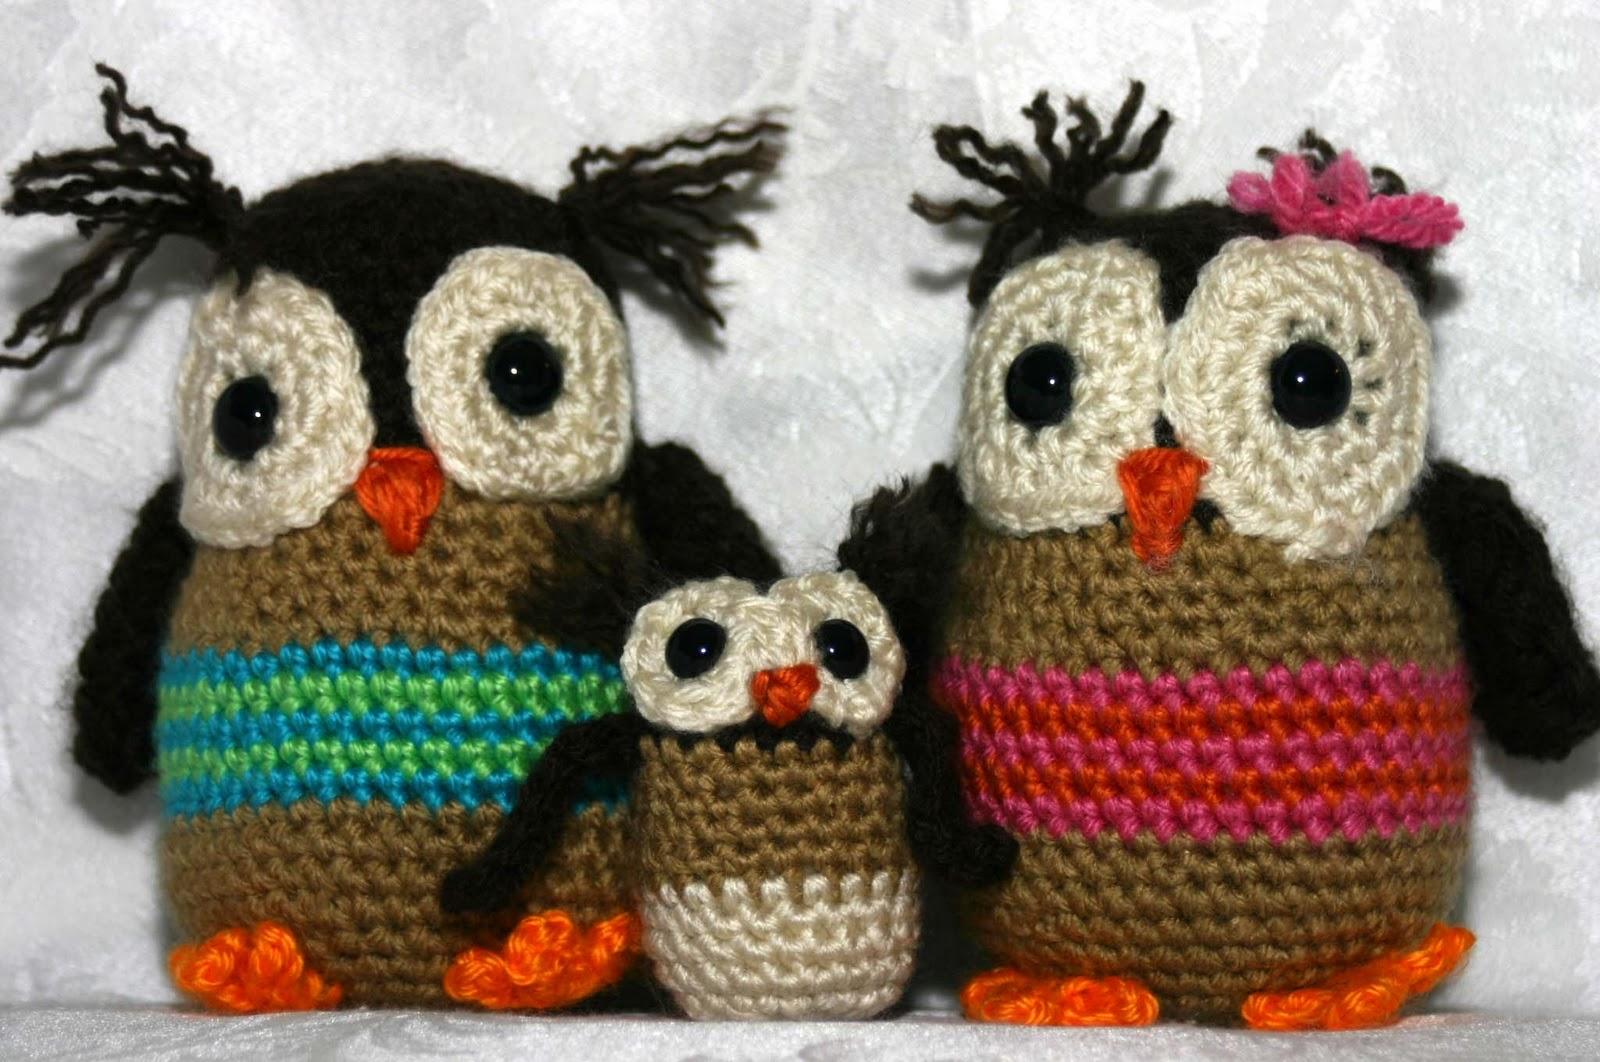 Crazy Frog Crochet: Adorable Crochet Critters